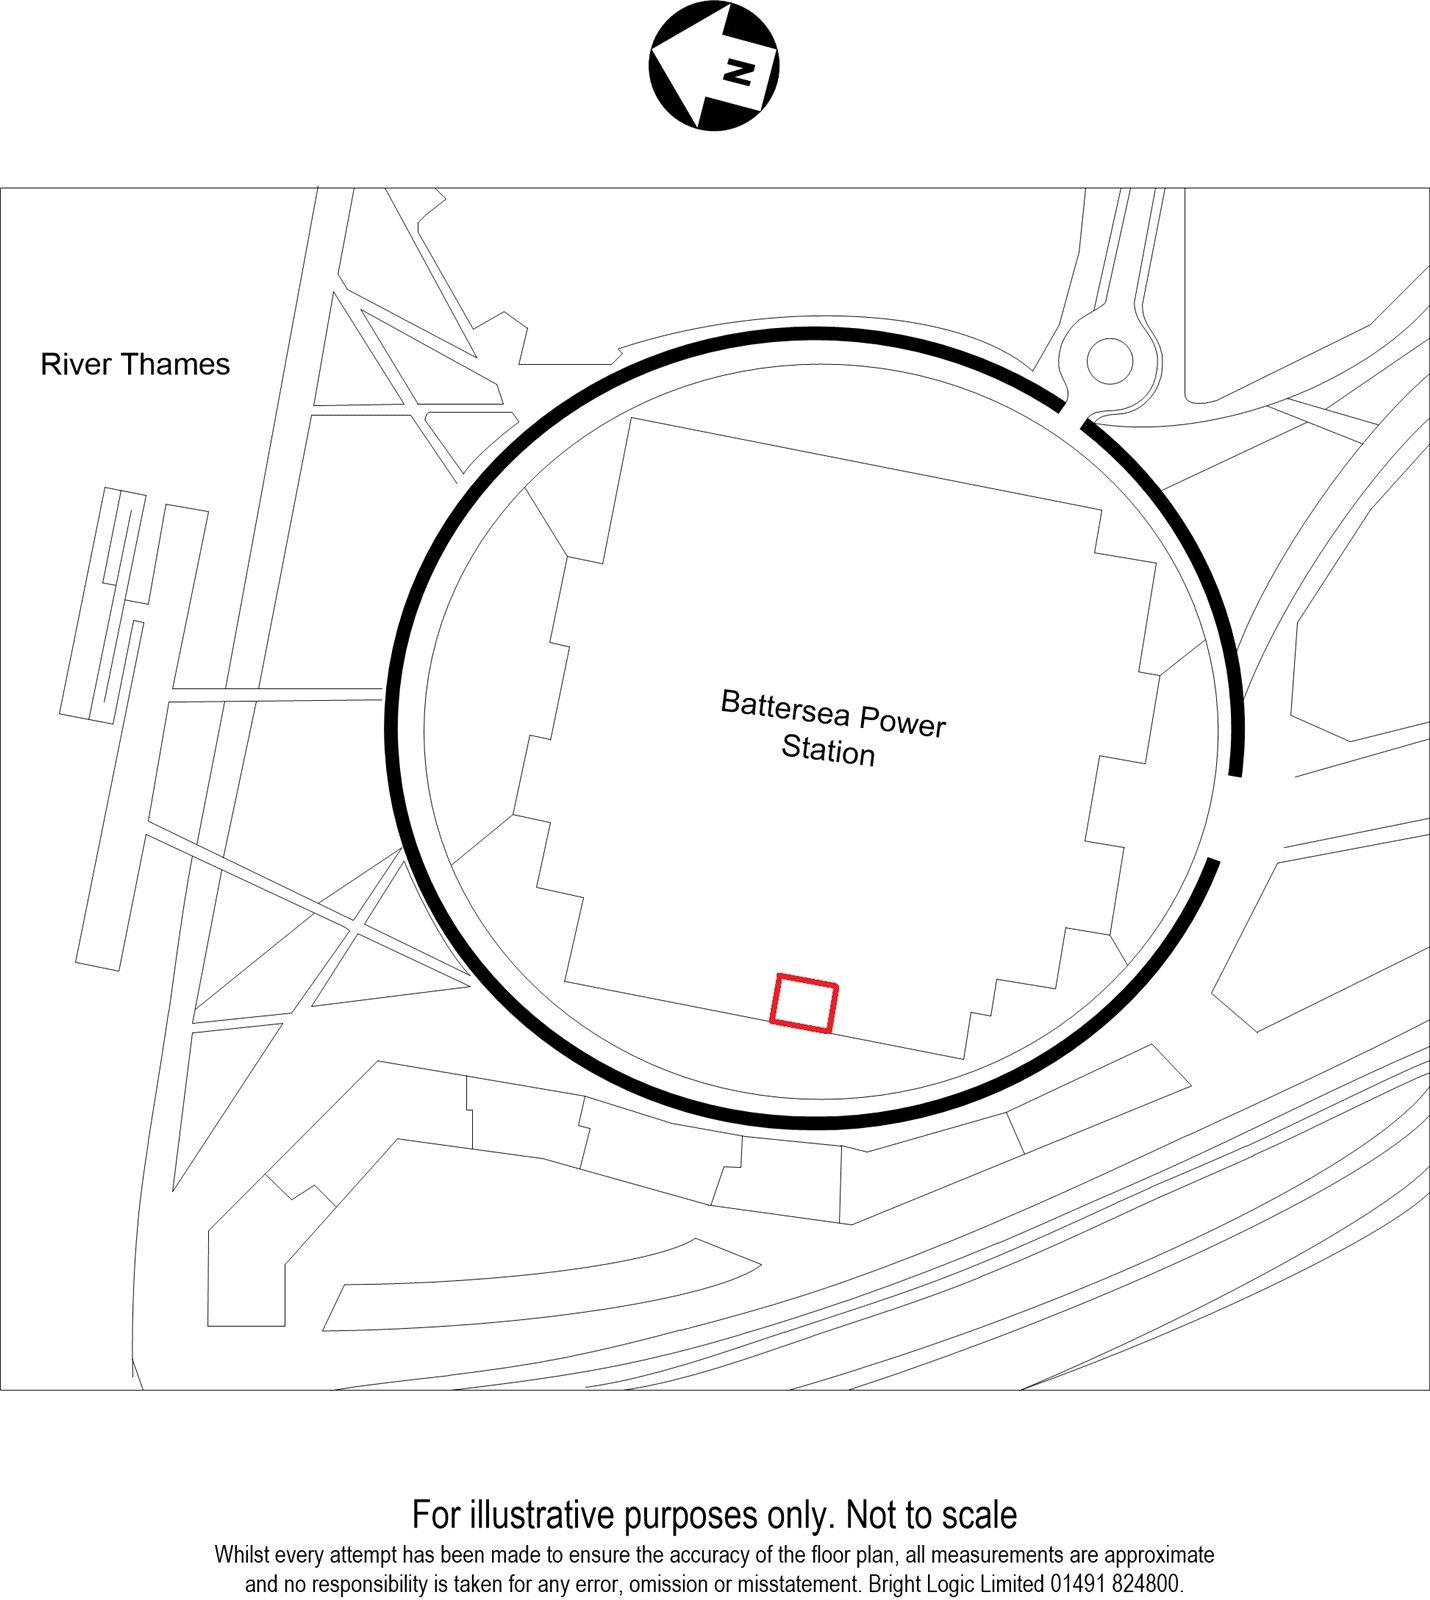 Switch House West Battersea Power Station London Sw8 1 Plant Logic Diagram Picture No